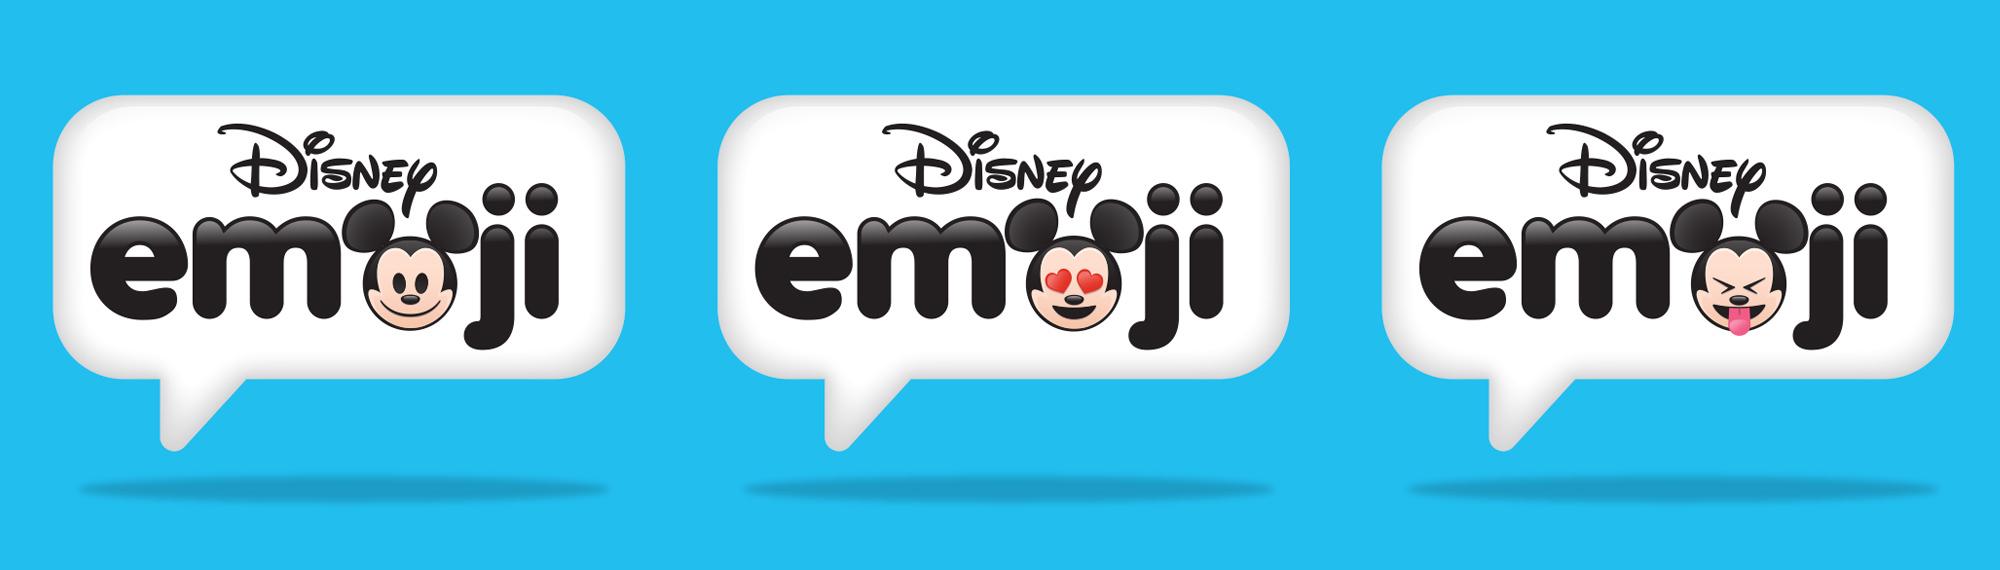 Disney mattson 04